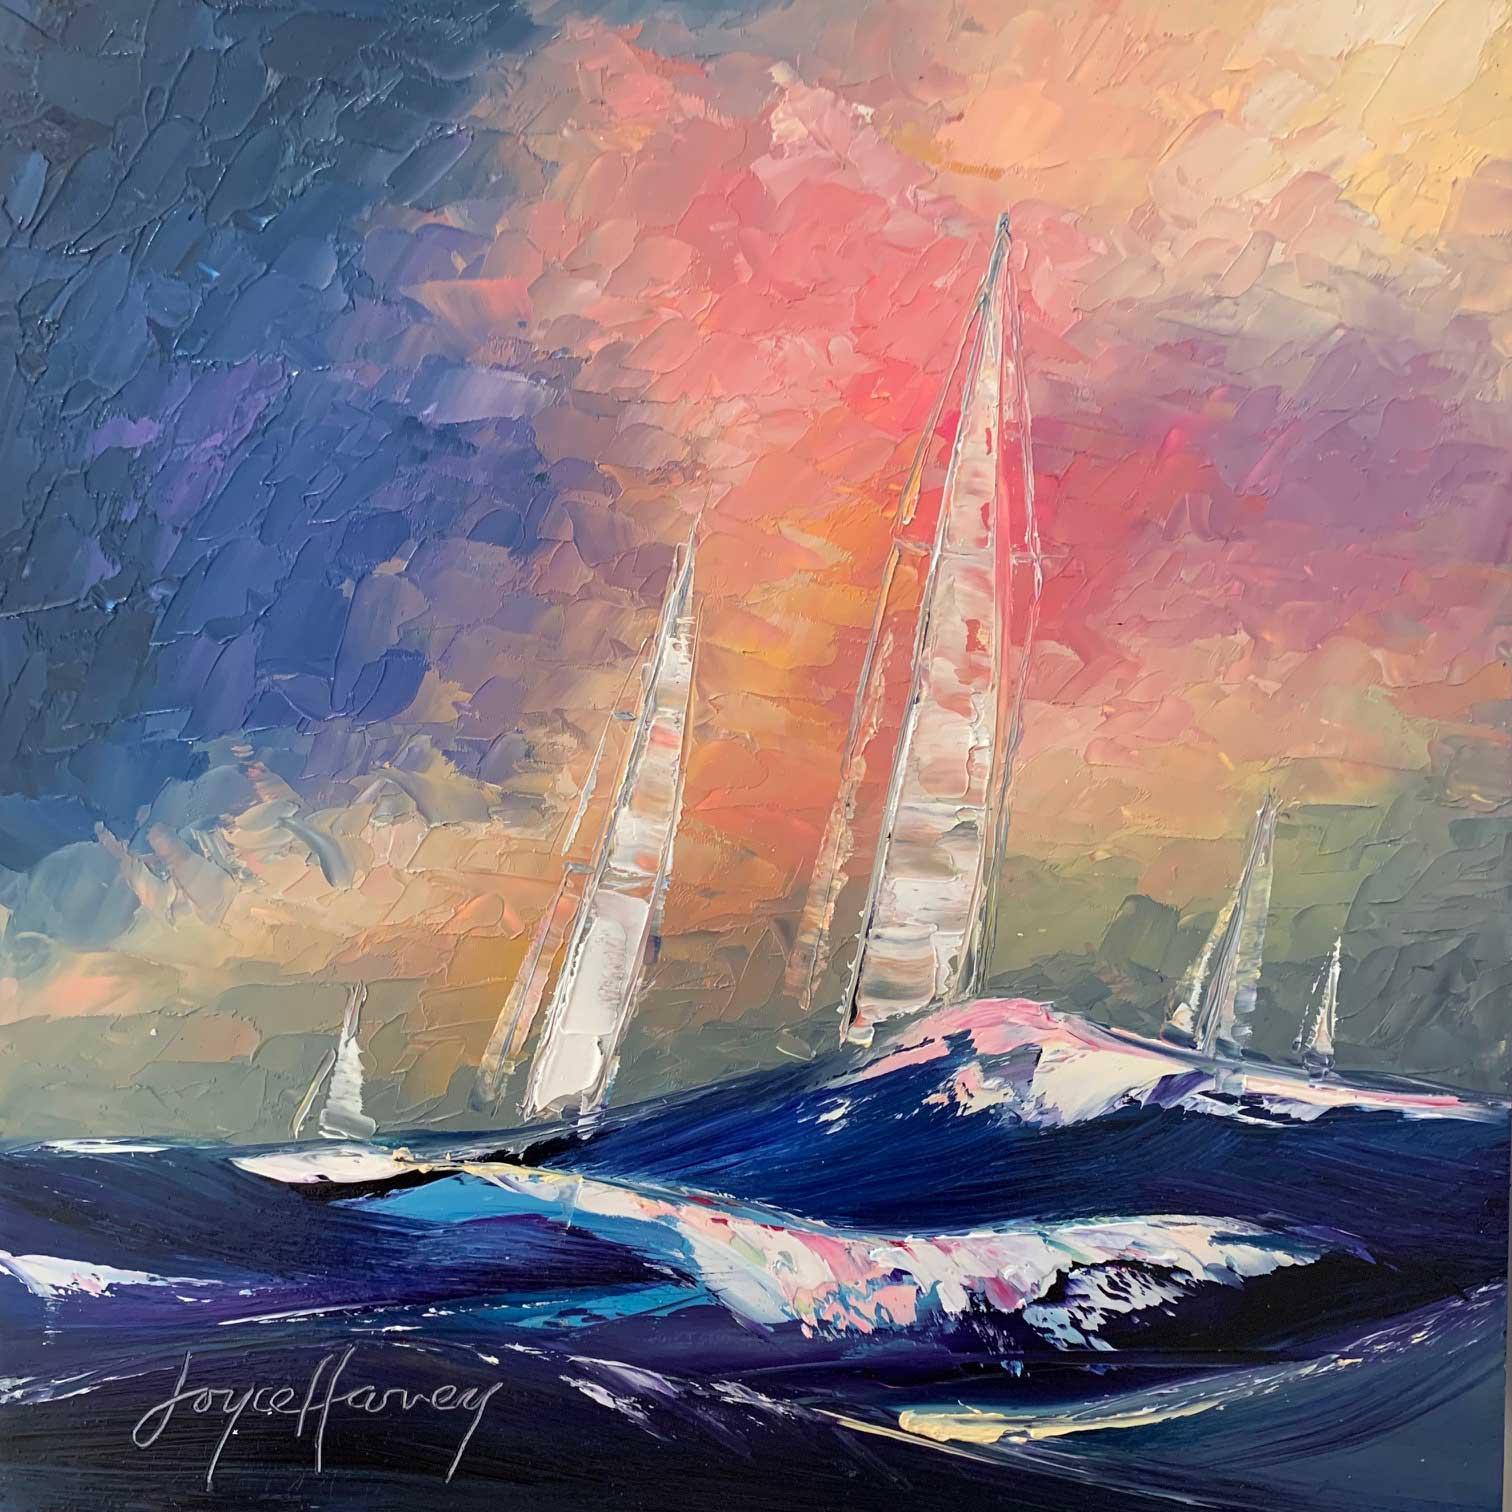 Joyce Harvey sea sail 8x8 $310 oil